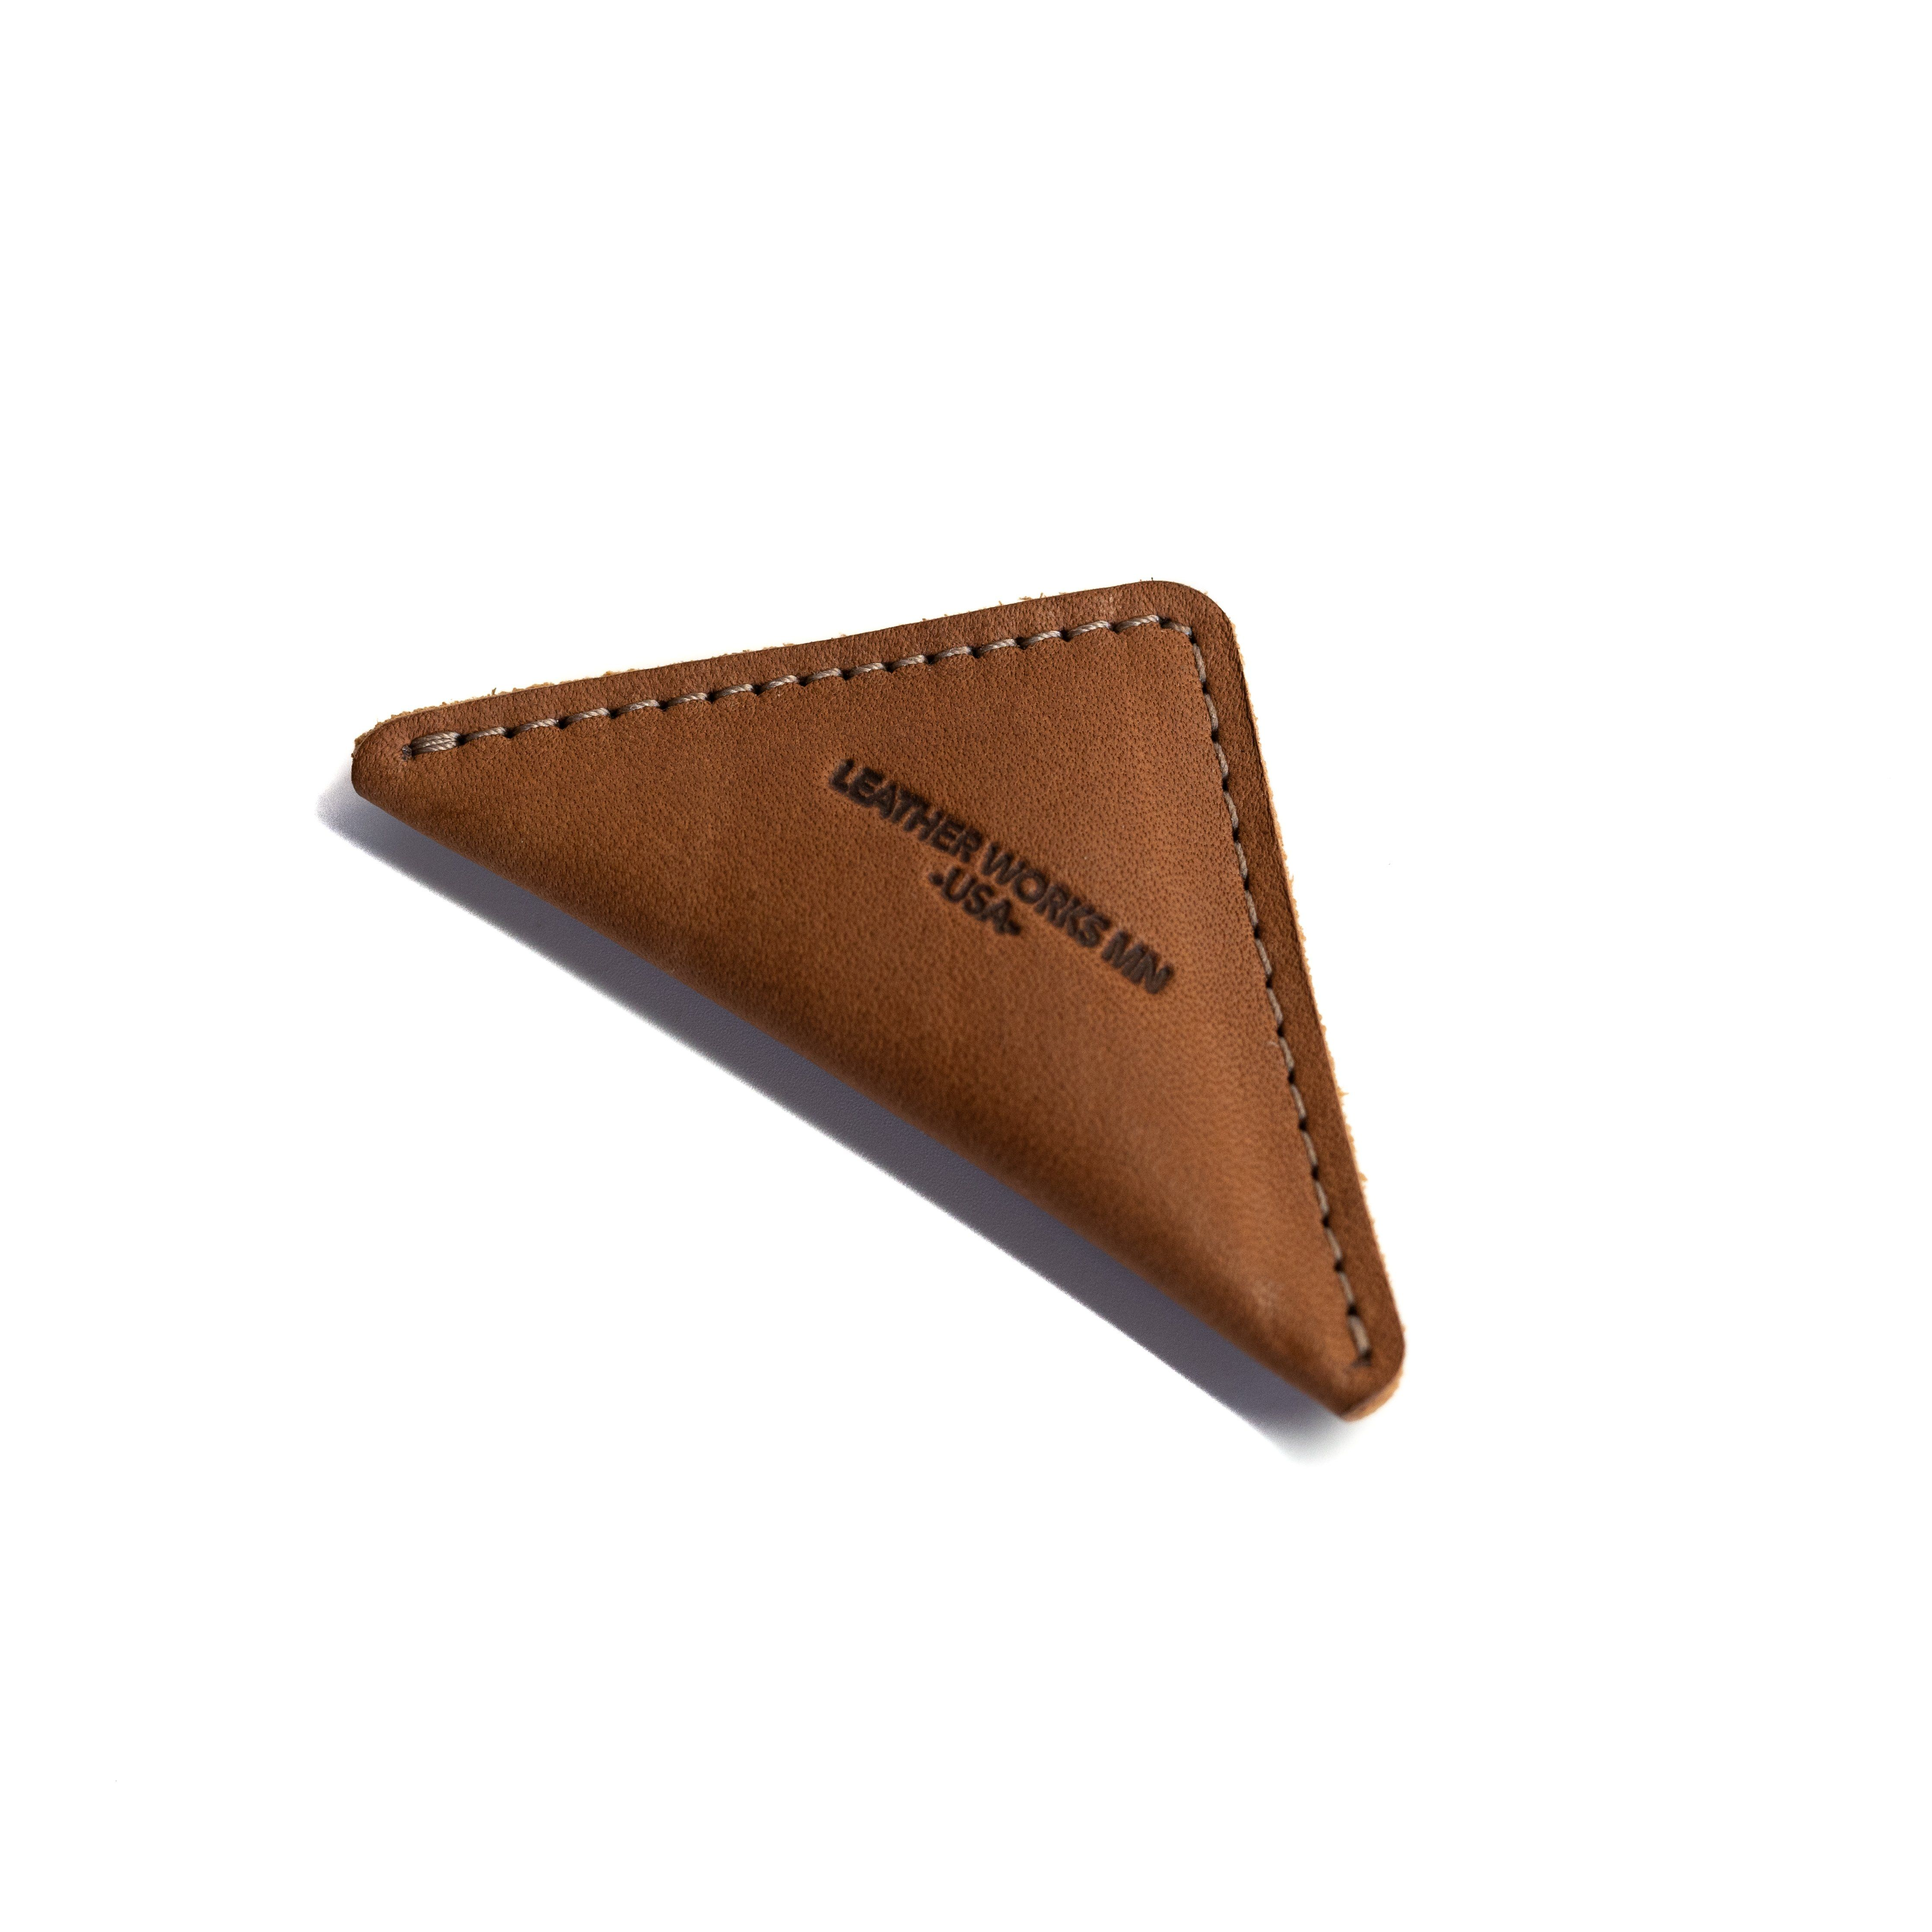 Leather Table Top Football – London Tan